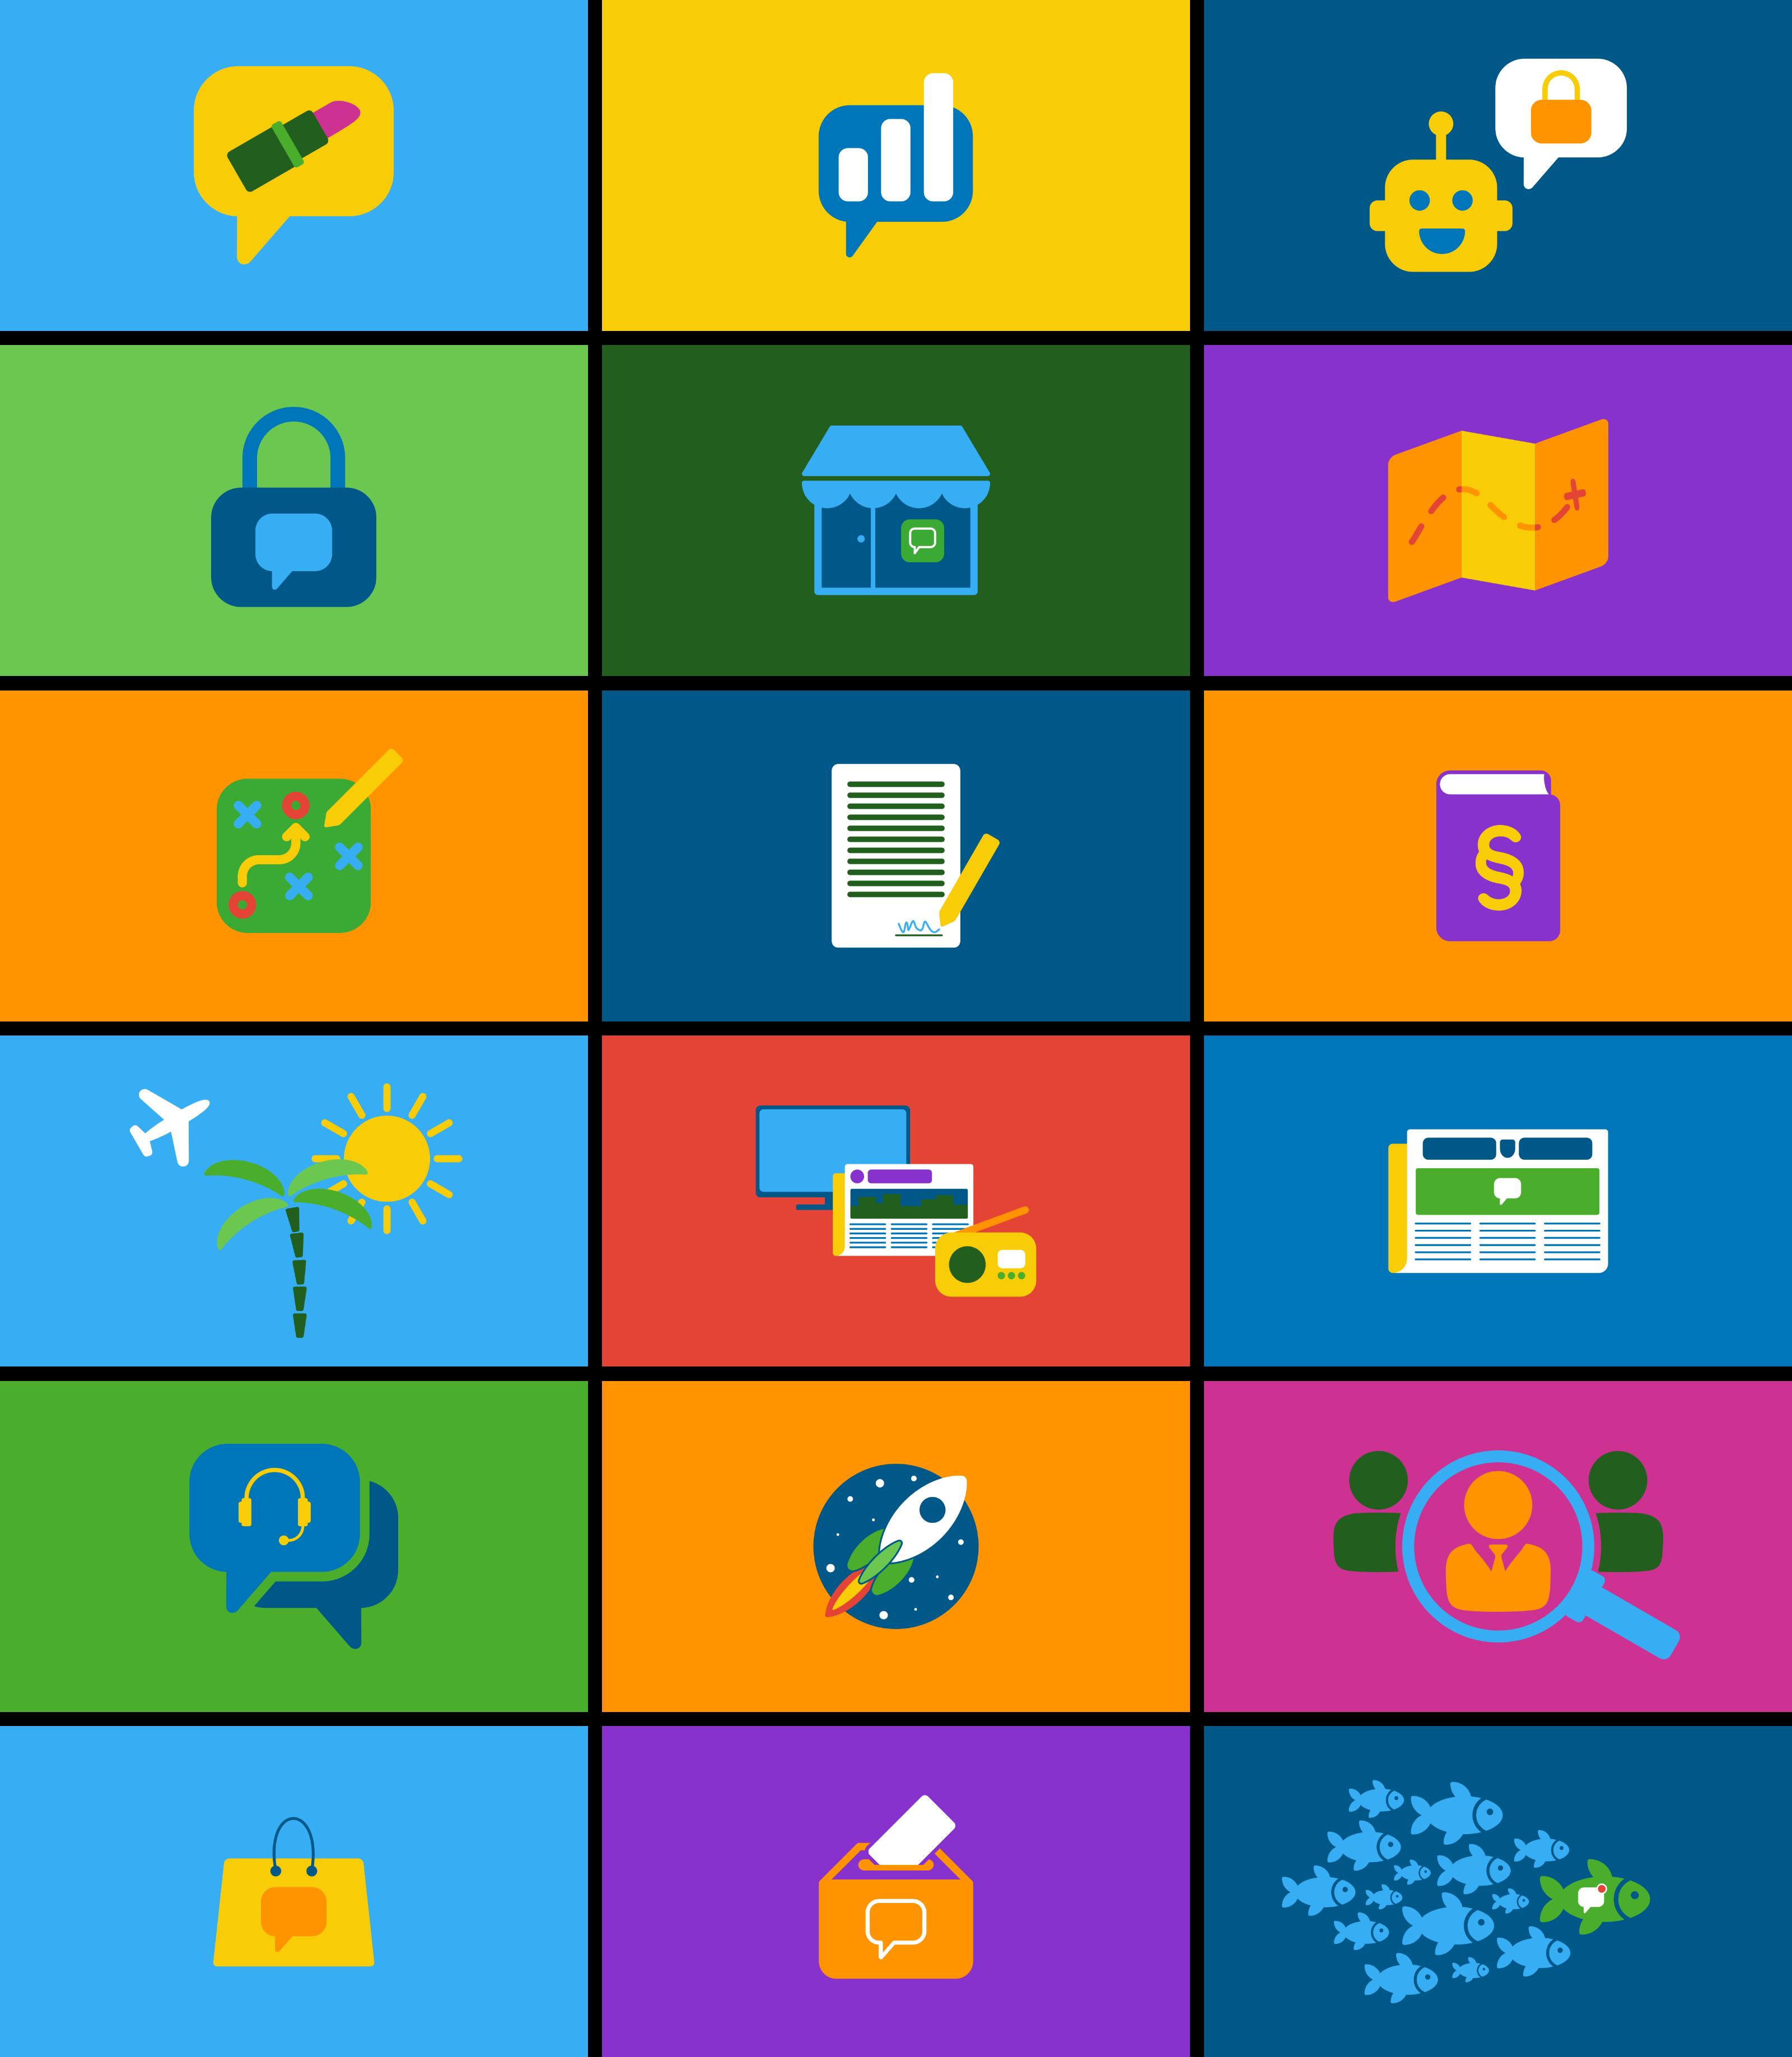 MessengerPeople - Brand Resources